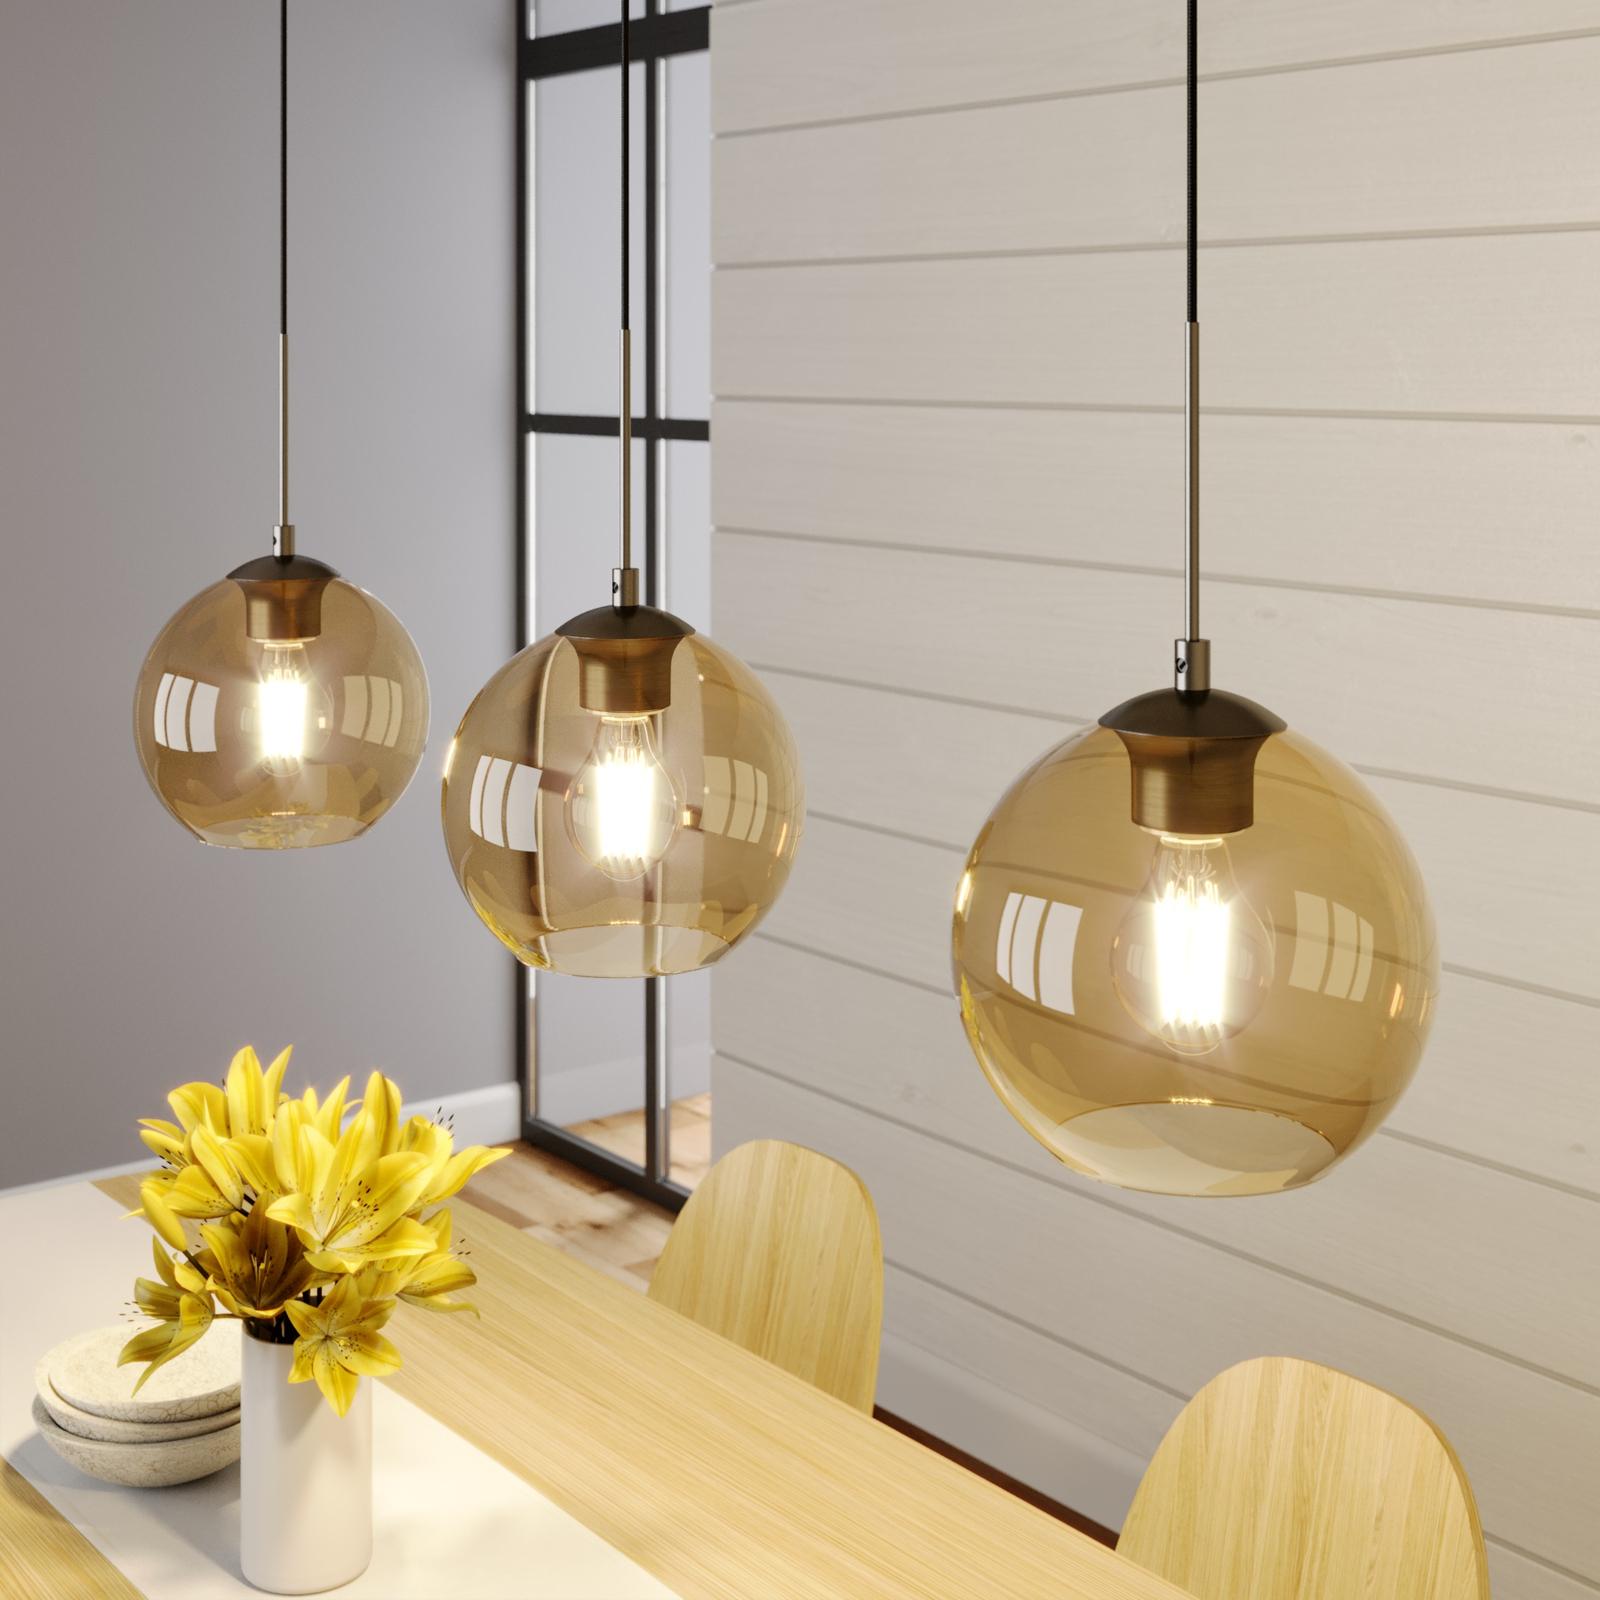 Lindby Sofian lampada a sospensione, 3 luci, ambra